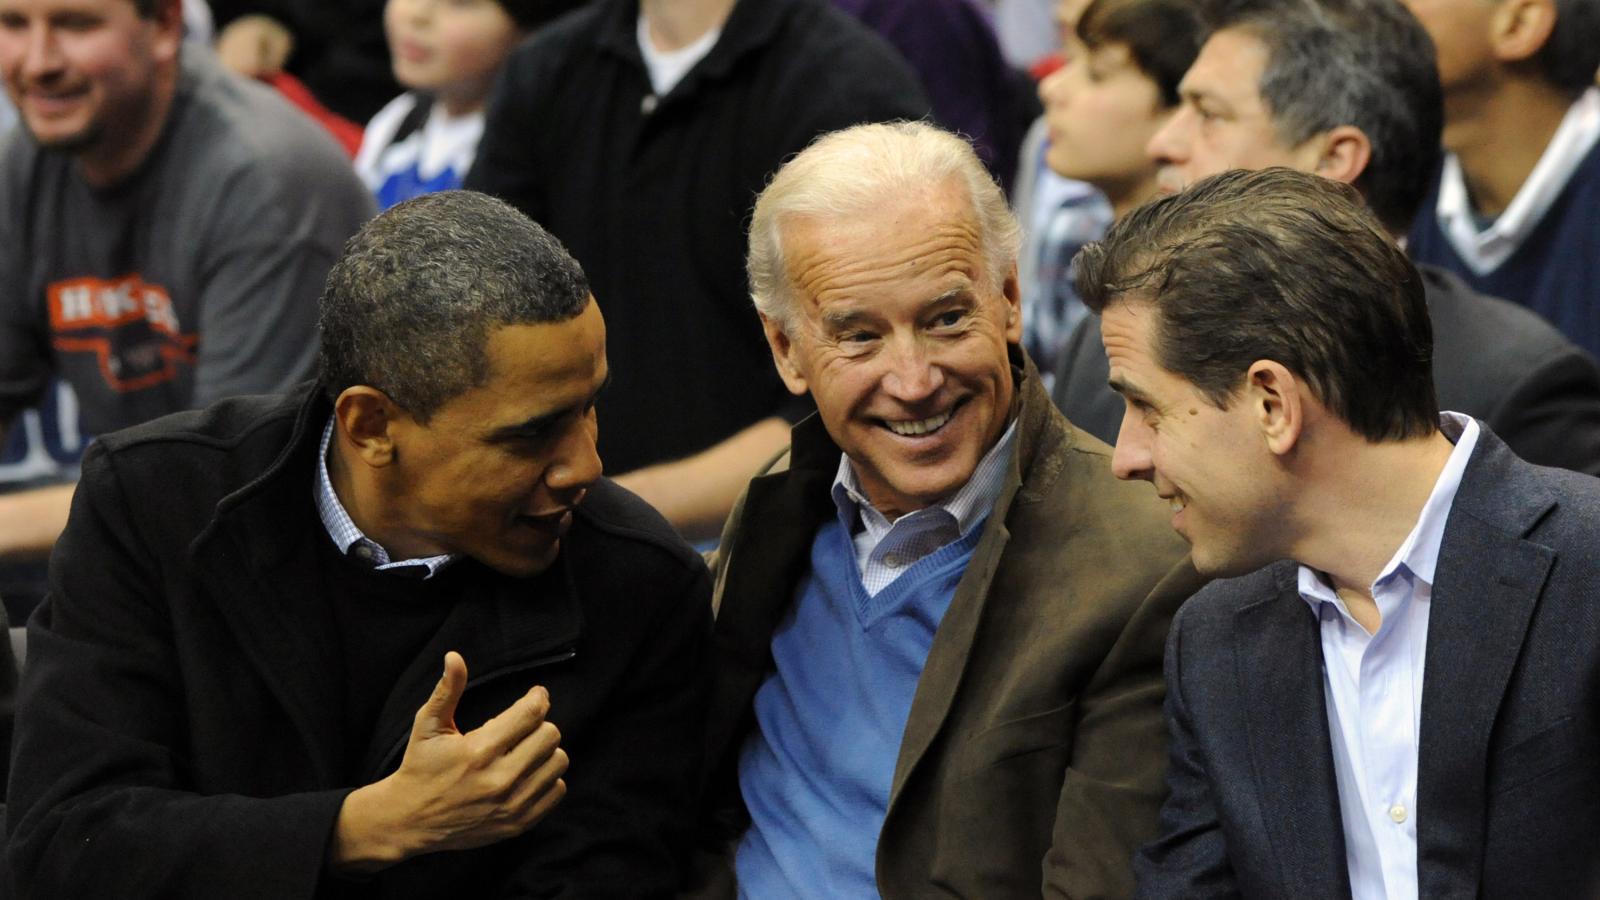 Hunter and Joe Biden with Obama